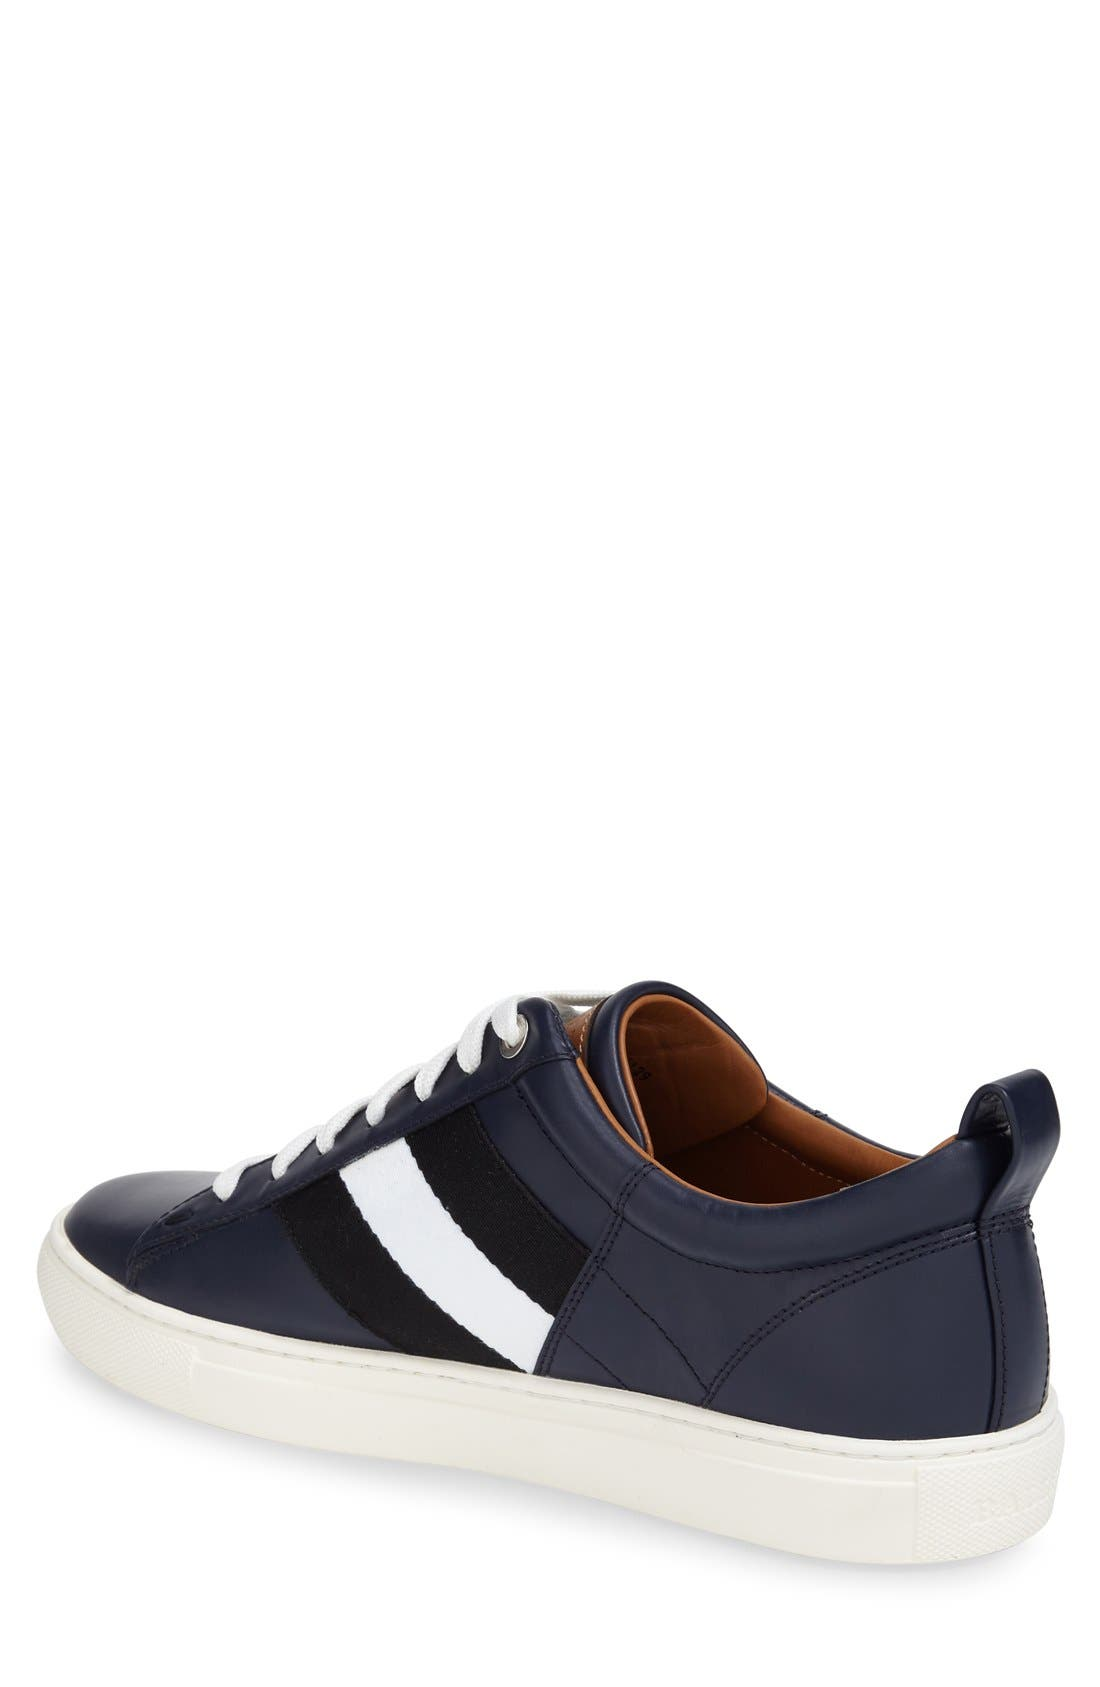 'Helvio' Sneaker,                             Alternate thumbnail 2, color,                             402